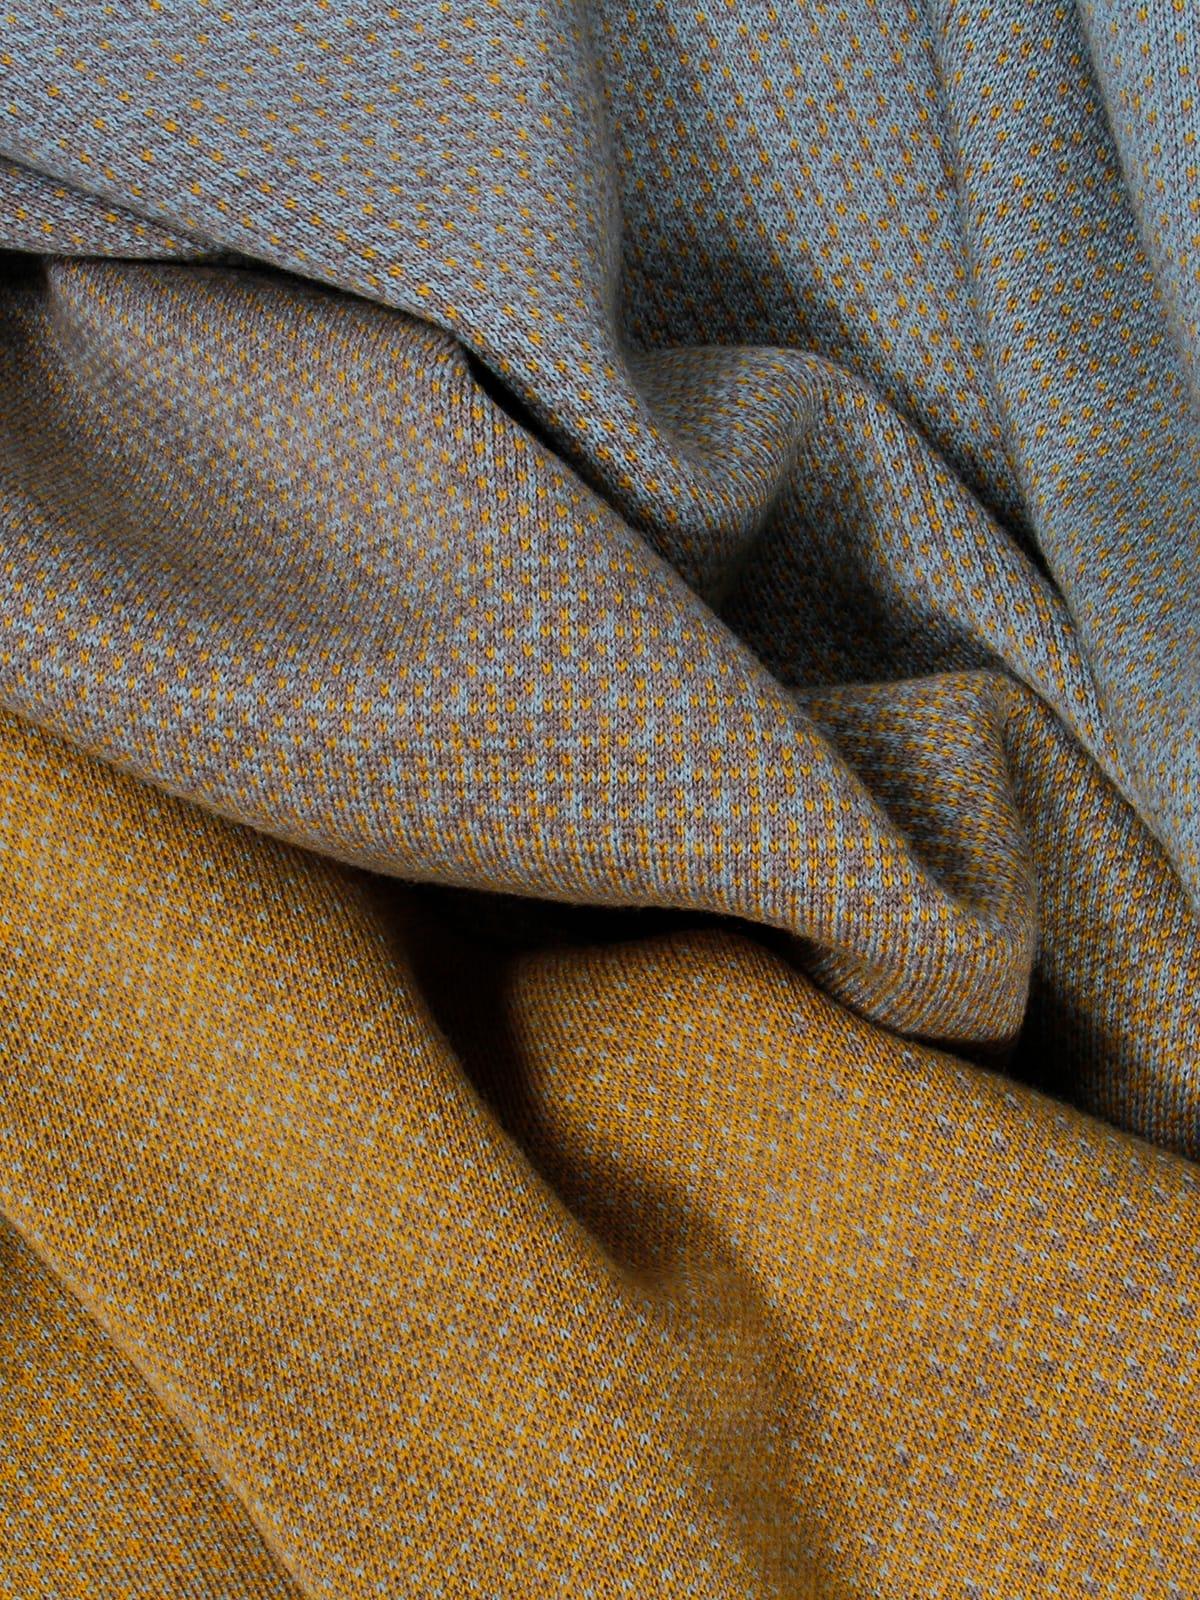 Knitted Blanket Lucca - Merino Wool details